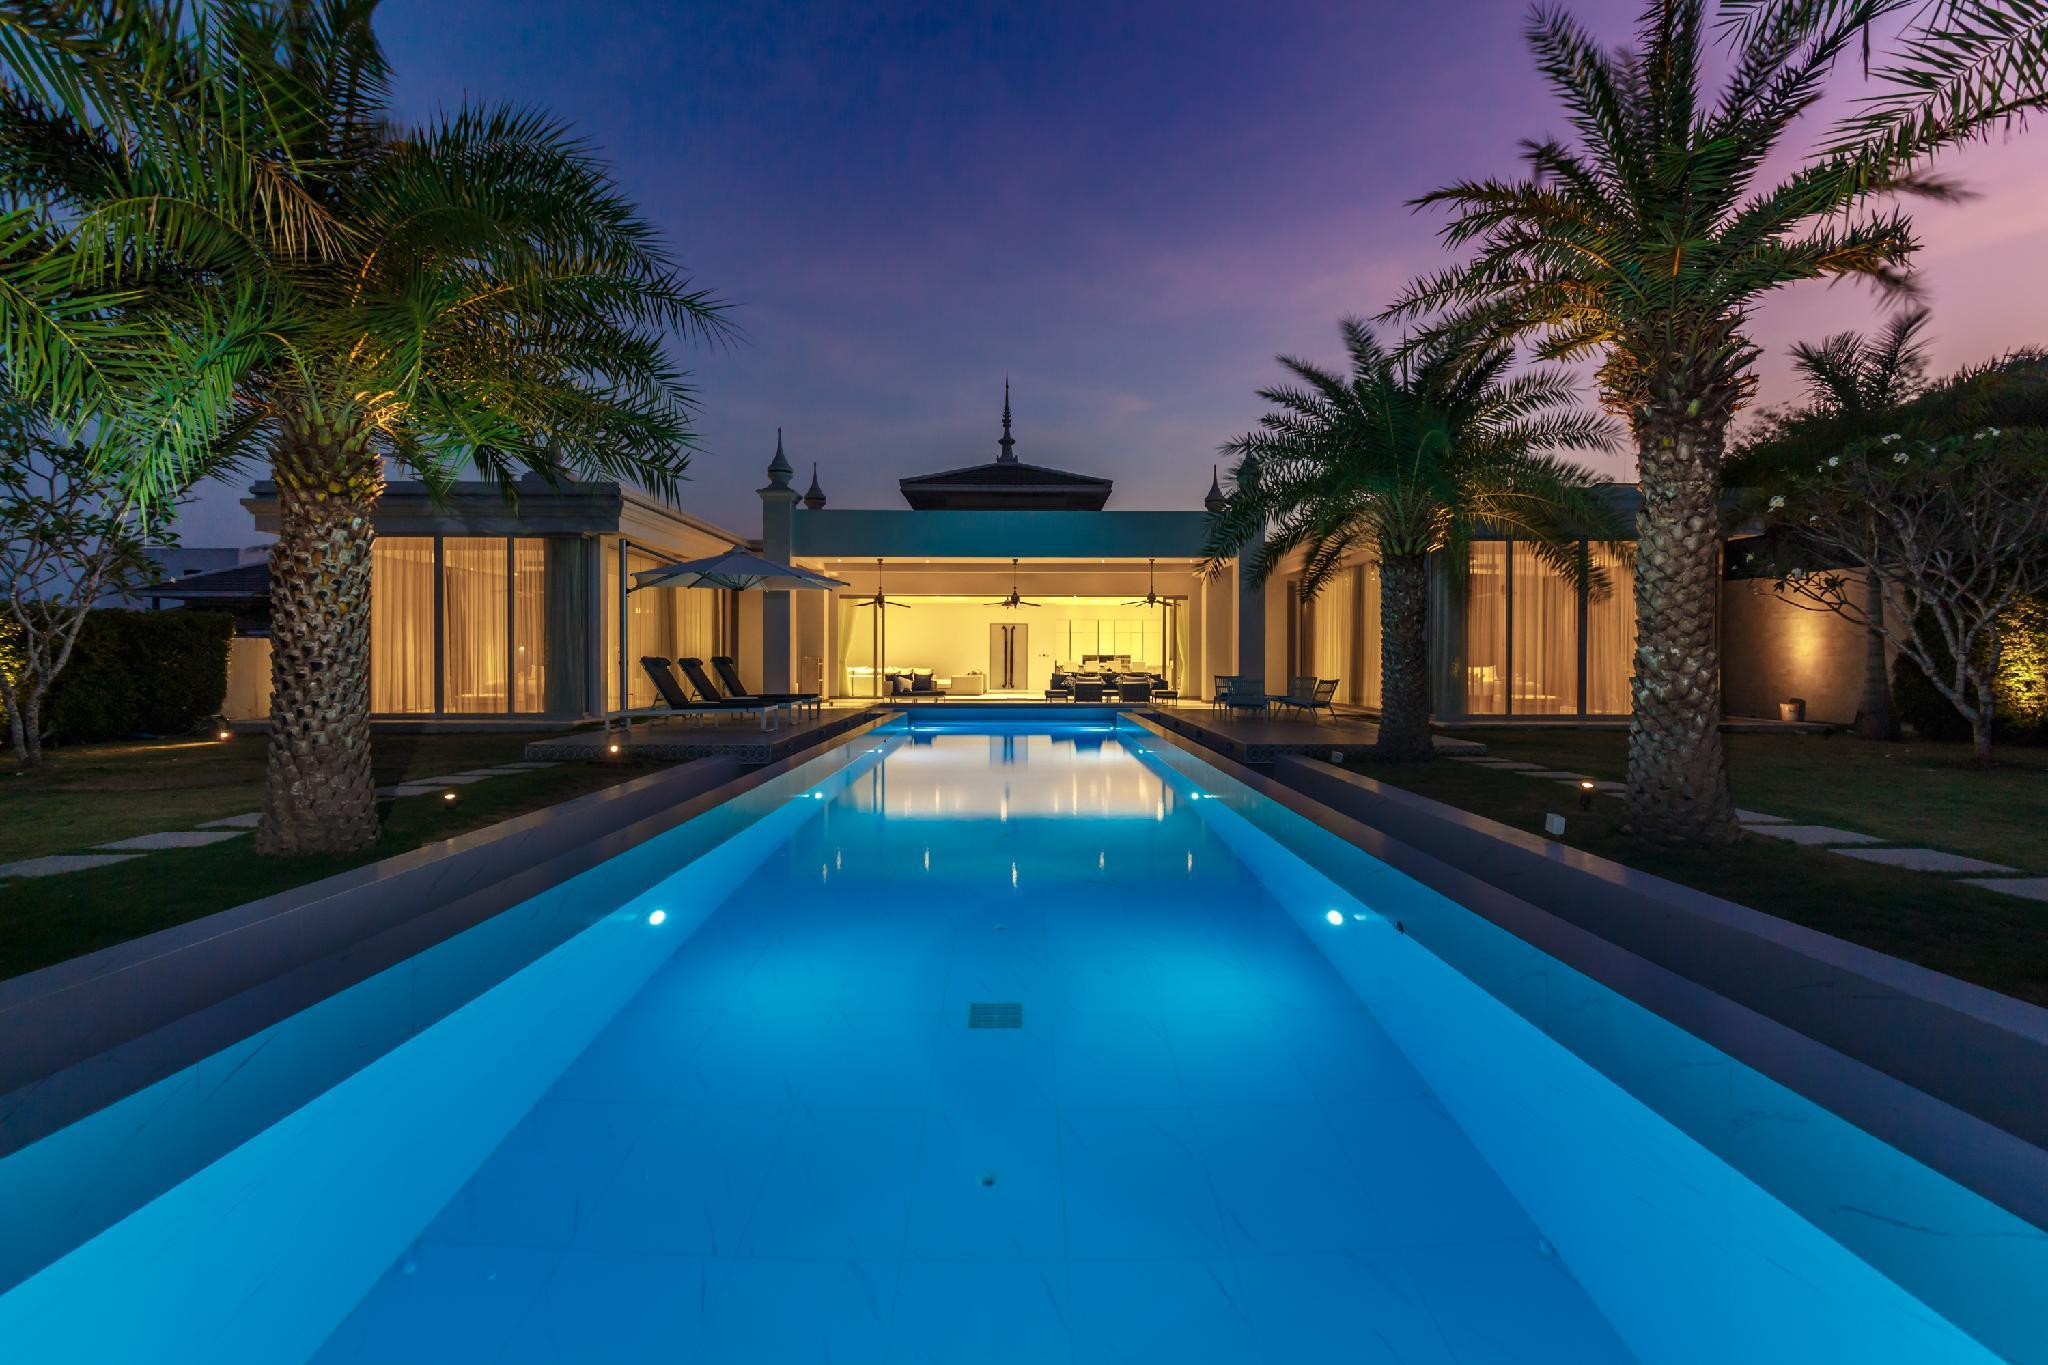 Gatsby villa, massive private pool villa in Rawai วิลลา 5 ห้องนอน 5 ห้องน้ำส่วนตัว ขนาด 600 ตร.ม. – หาดราไวย์